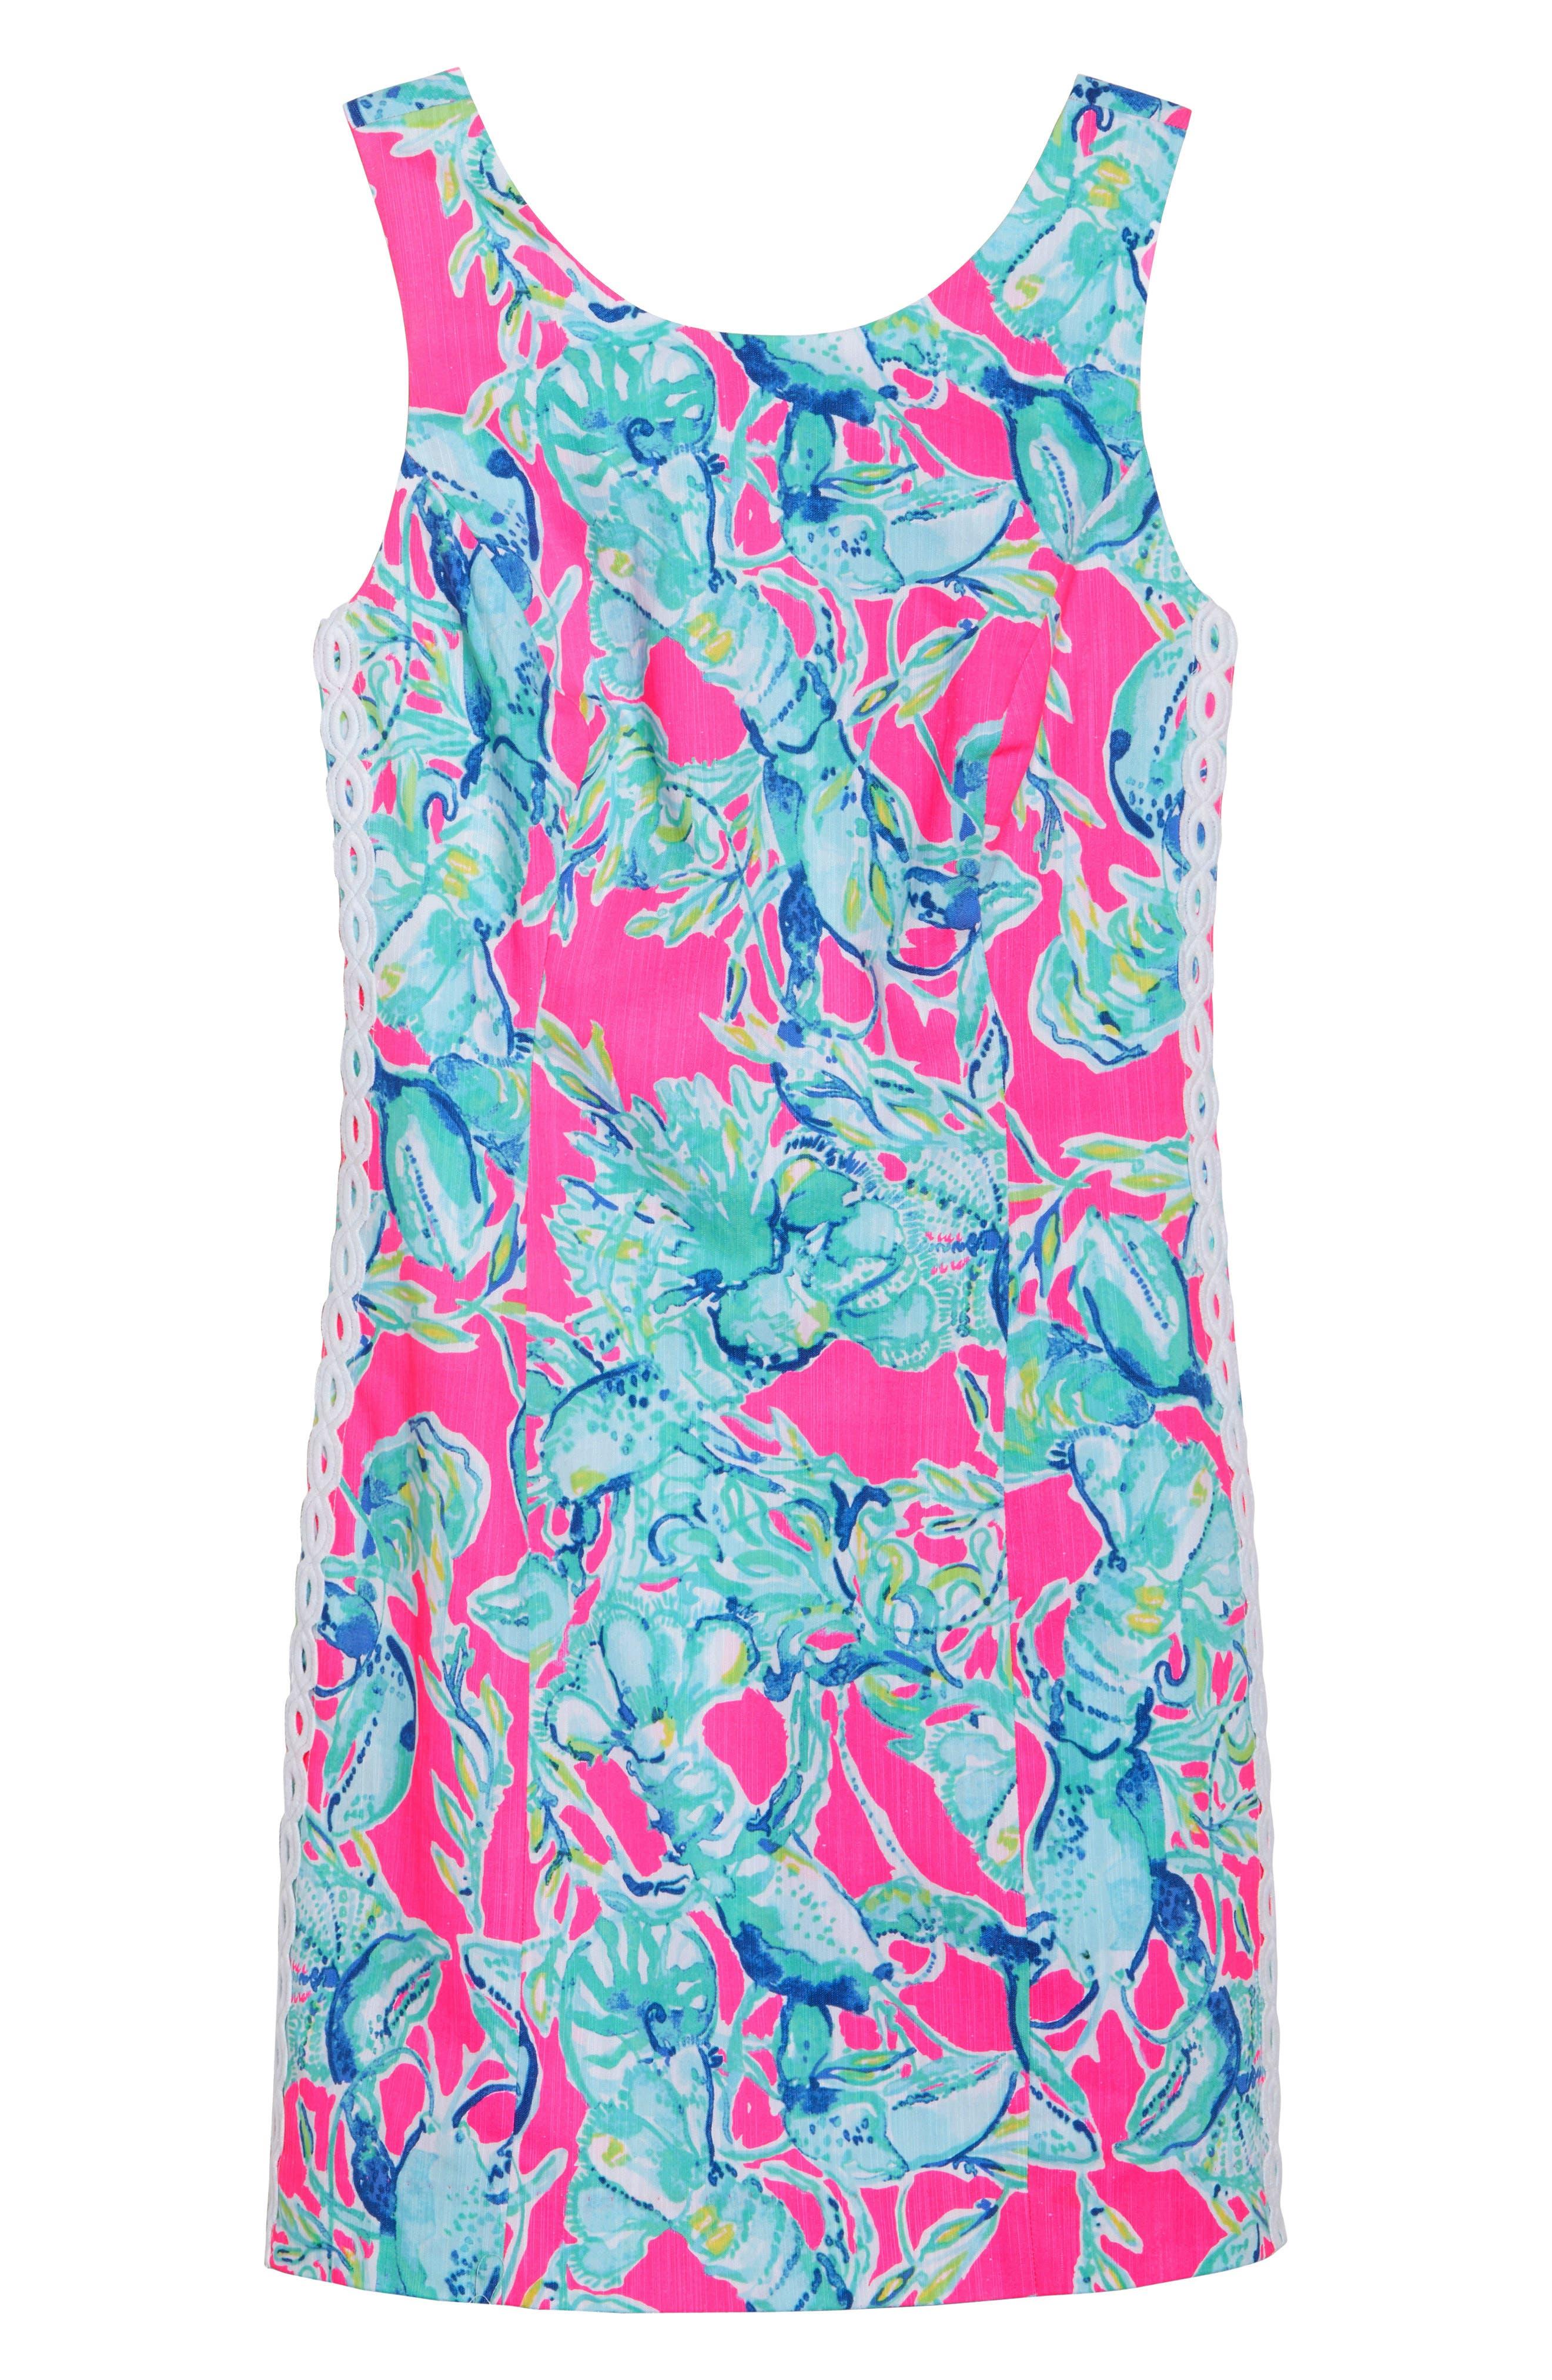 Mila Sheath Dress,                             Alternate thumbnail 7, color,                             Raz Berry Lobsters In Love